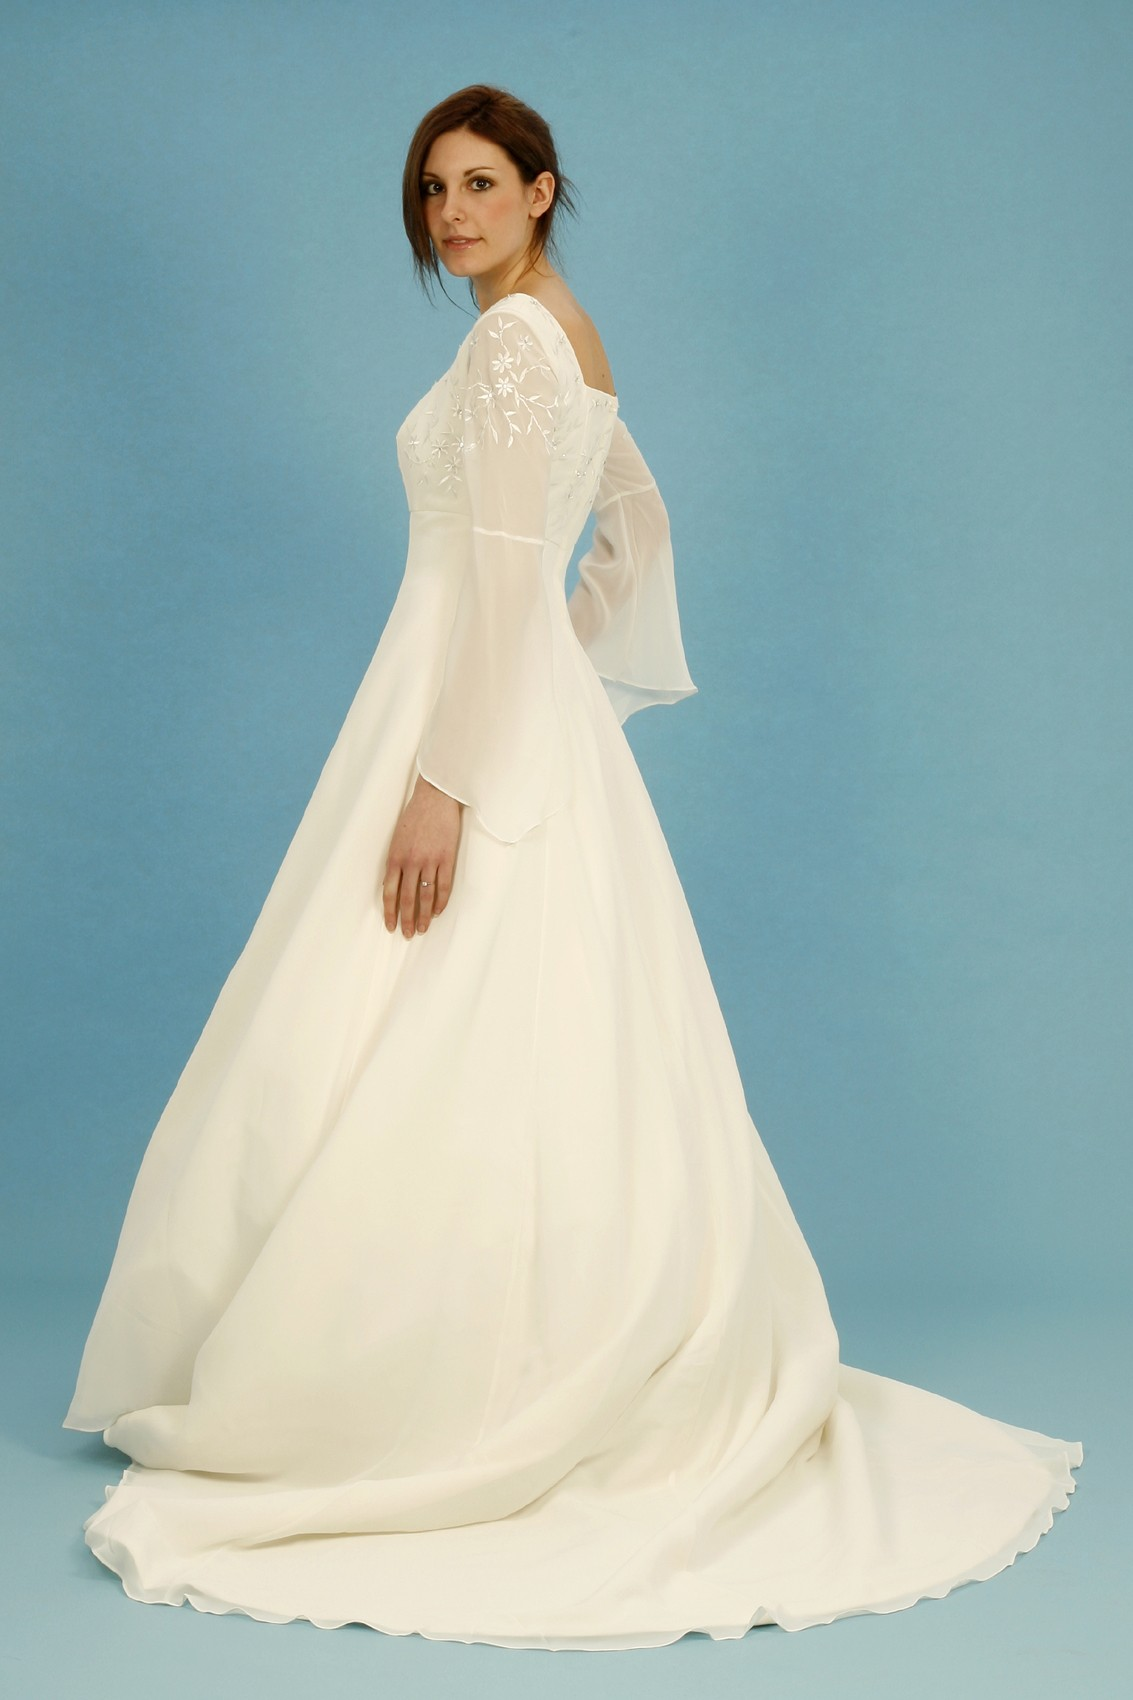 Perfect Sherbet Wedding Dress Crest - All Wedding Dresses ...